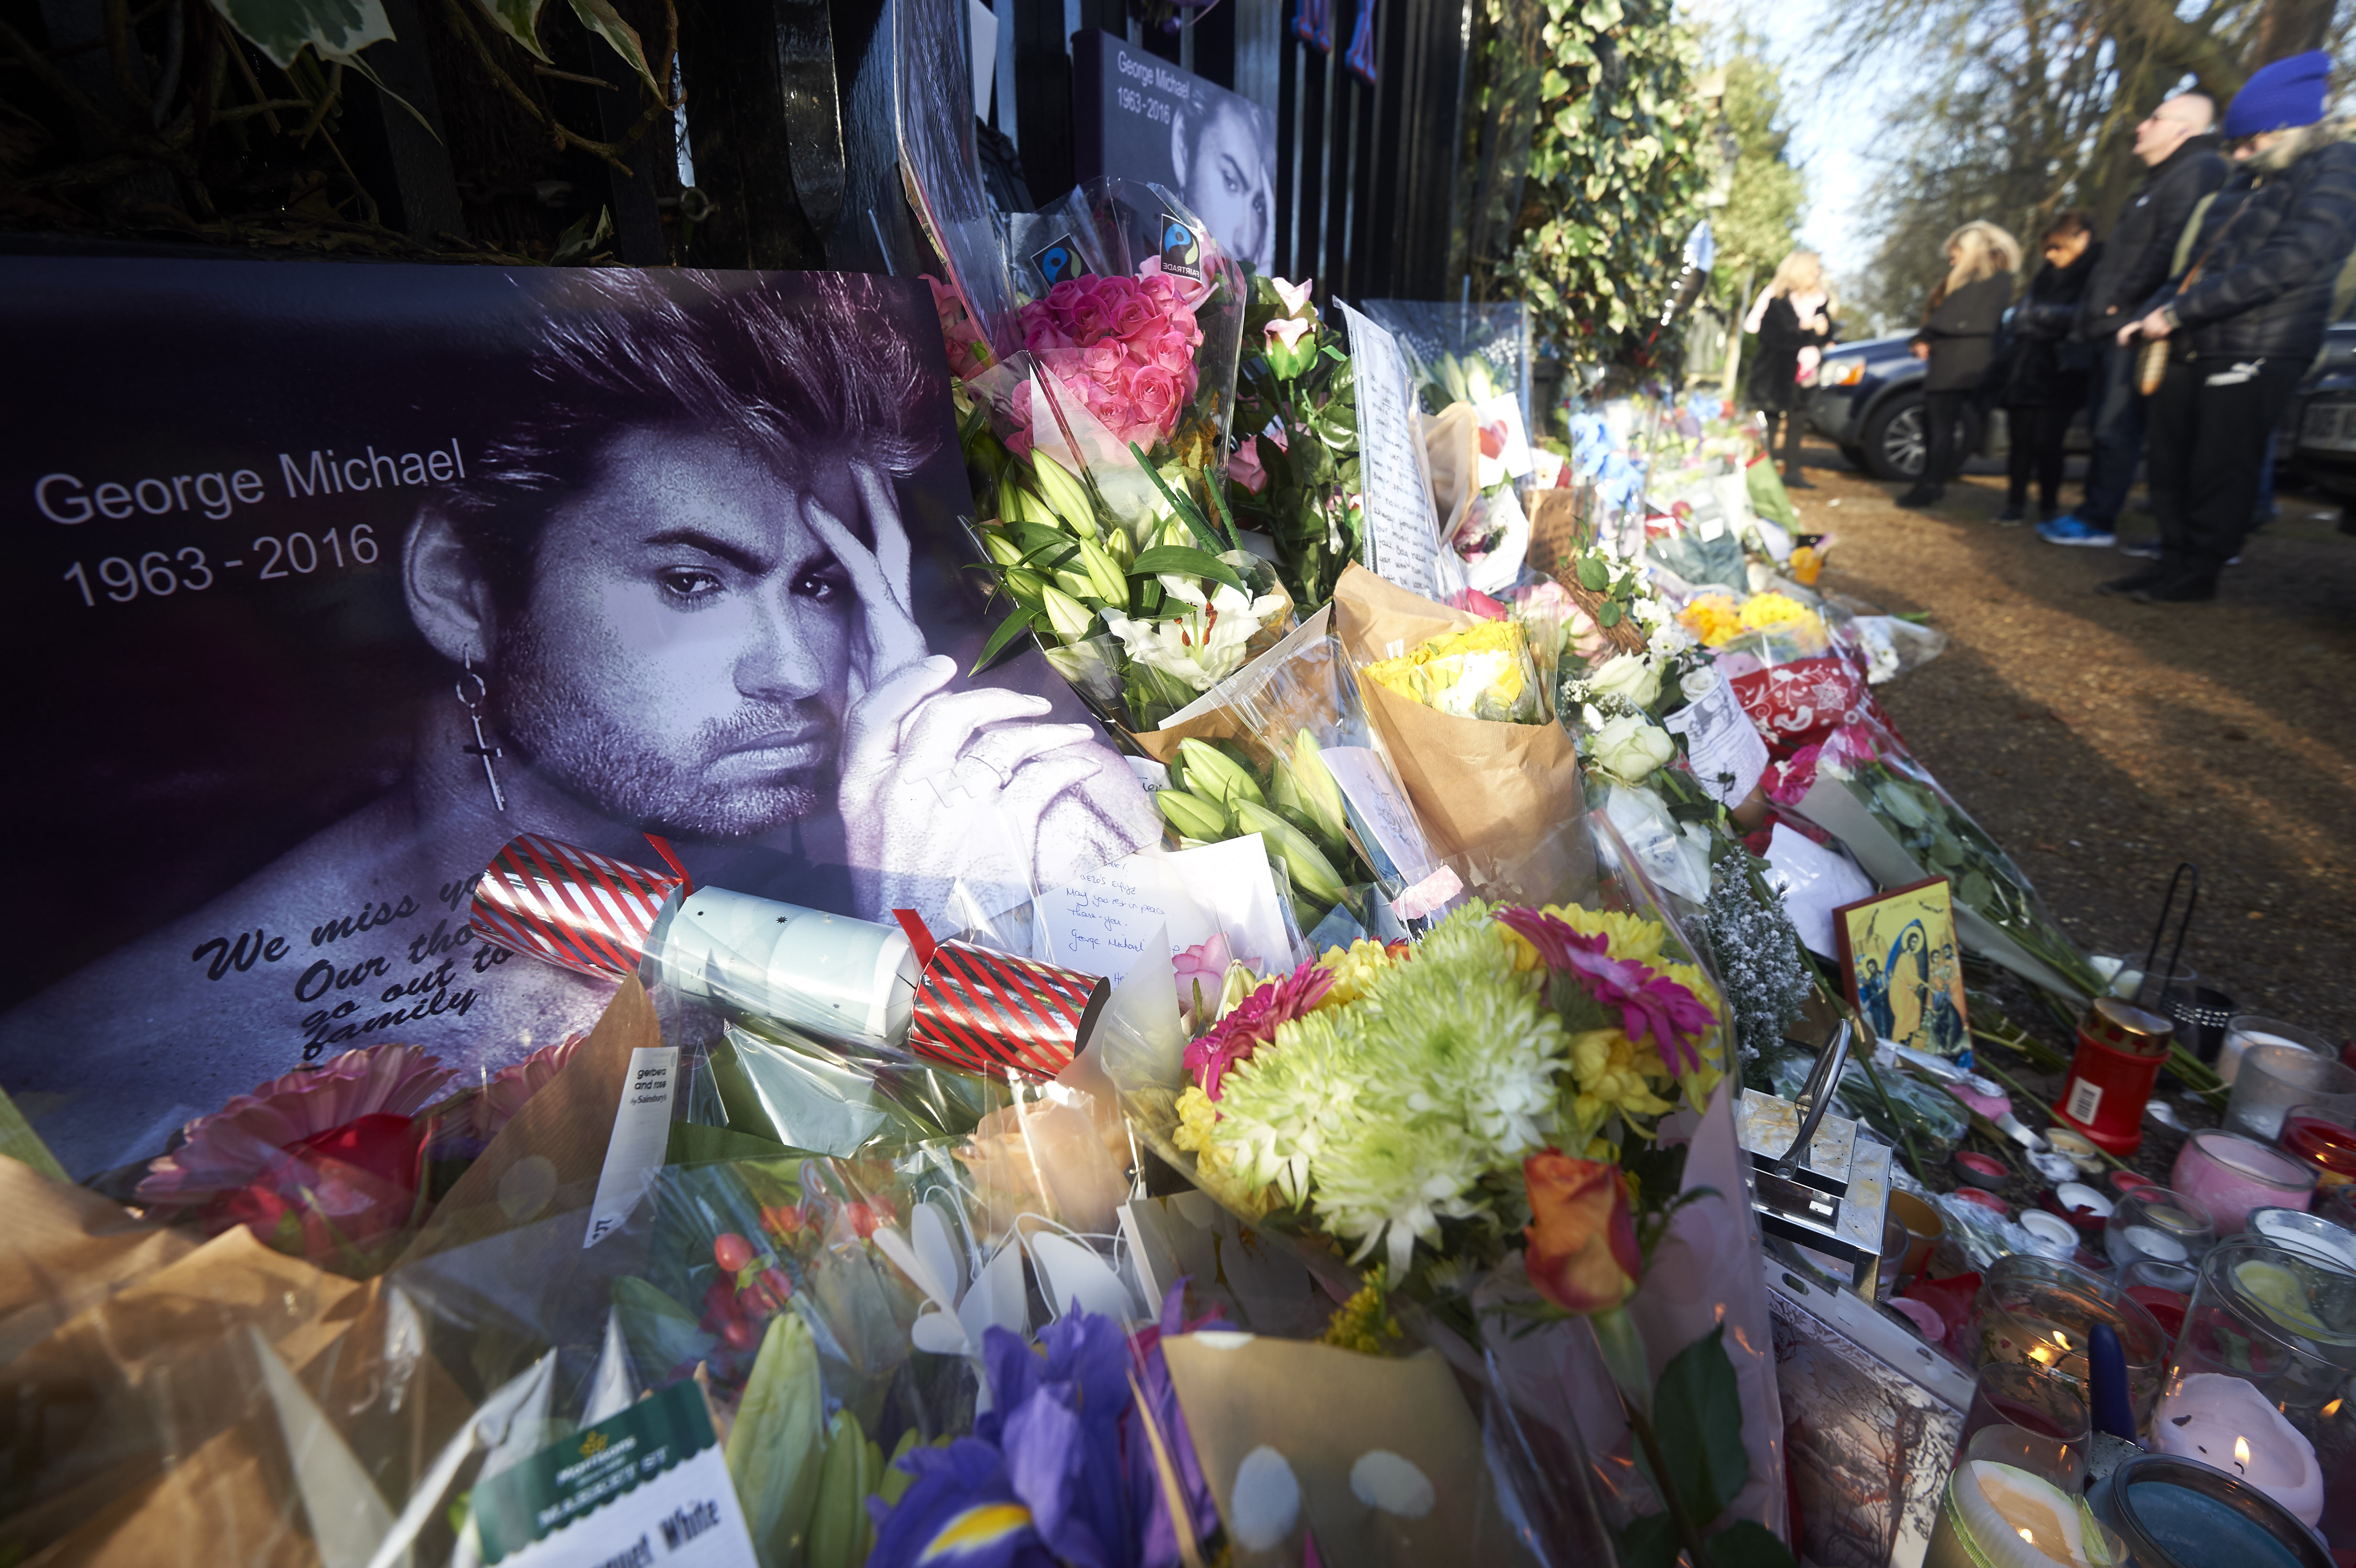 George Michael: Forense confirma que cantante murió por causas naturales